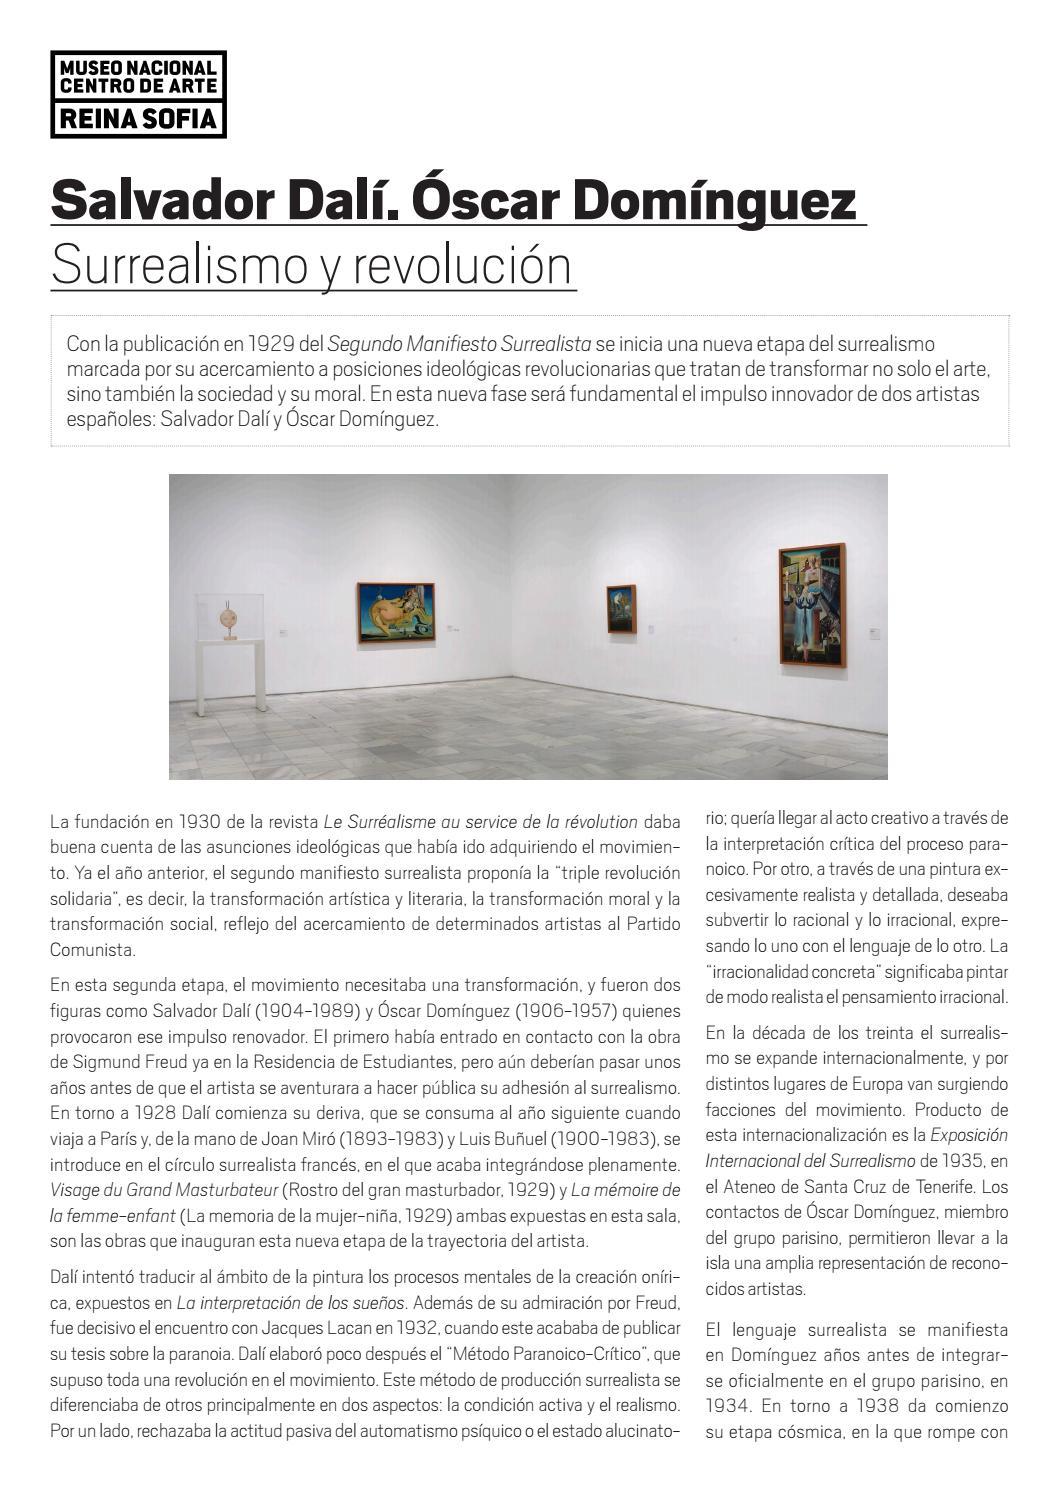 205espwebcompleto By Museo Reina Sofía Issuu